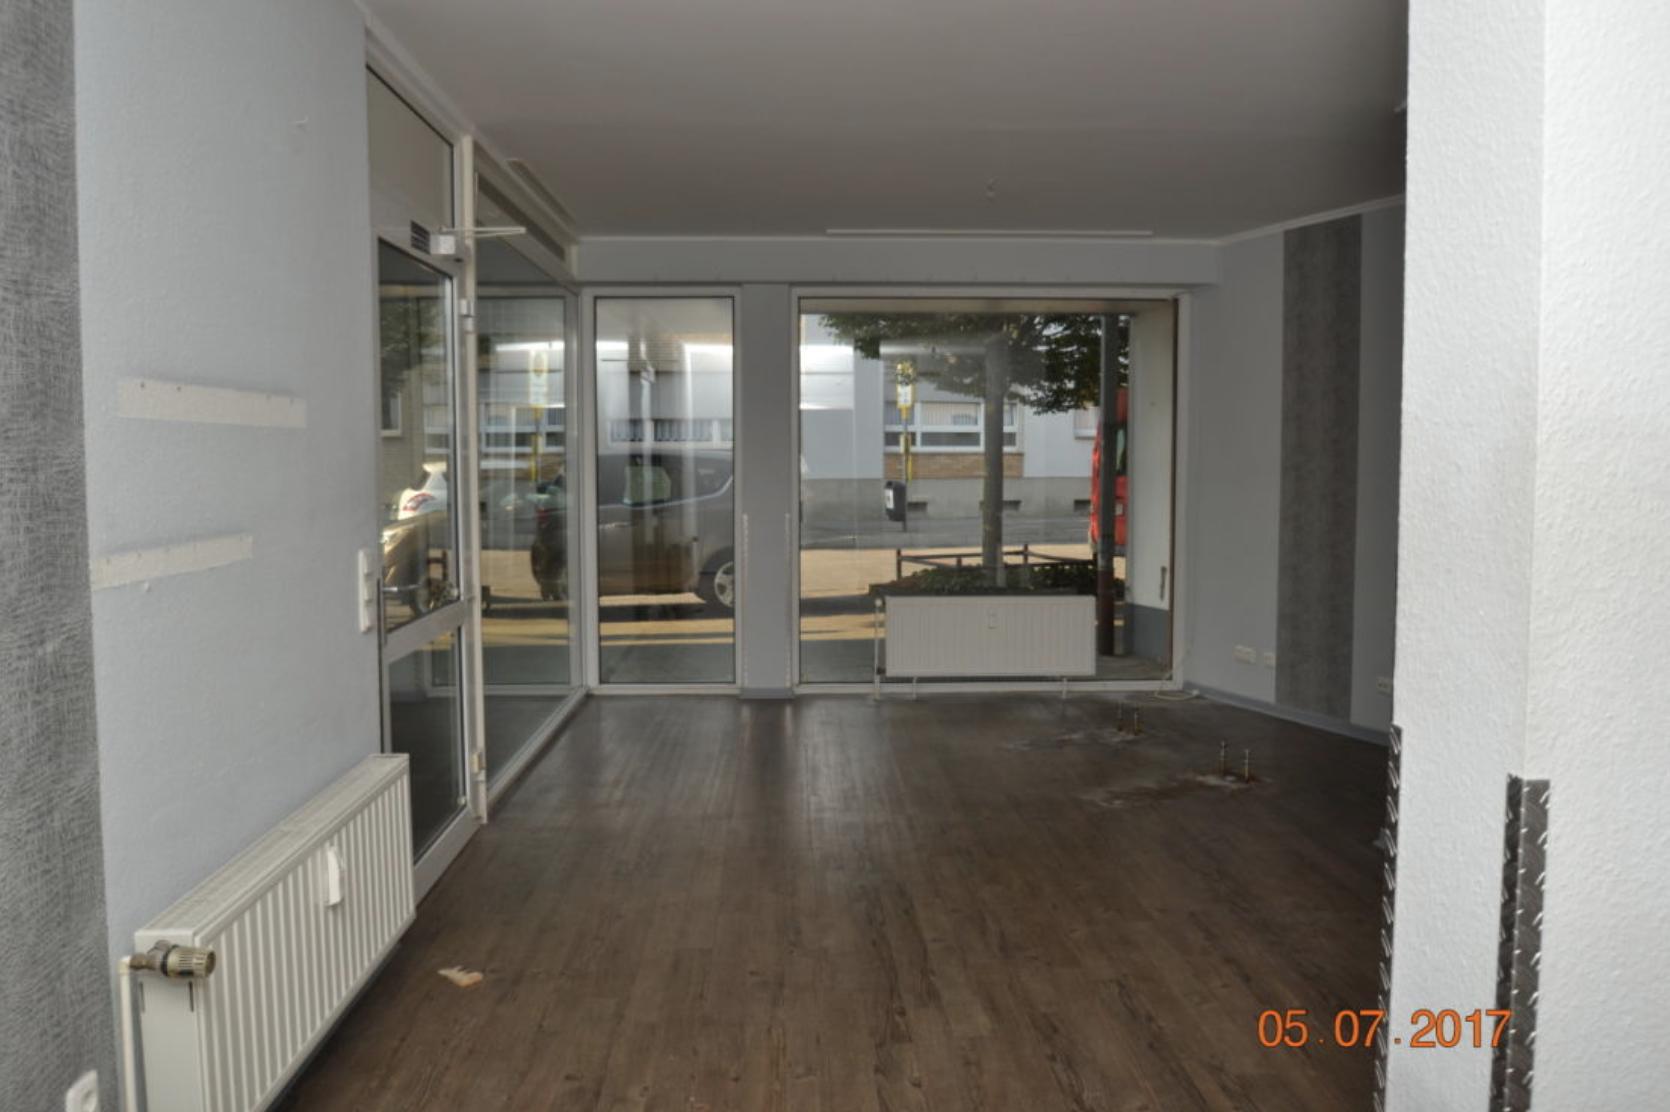 Schöne Büro-, Geschäftsräume an belebter Einkaufsstraße!!